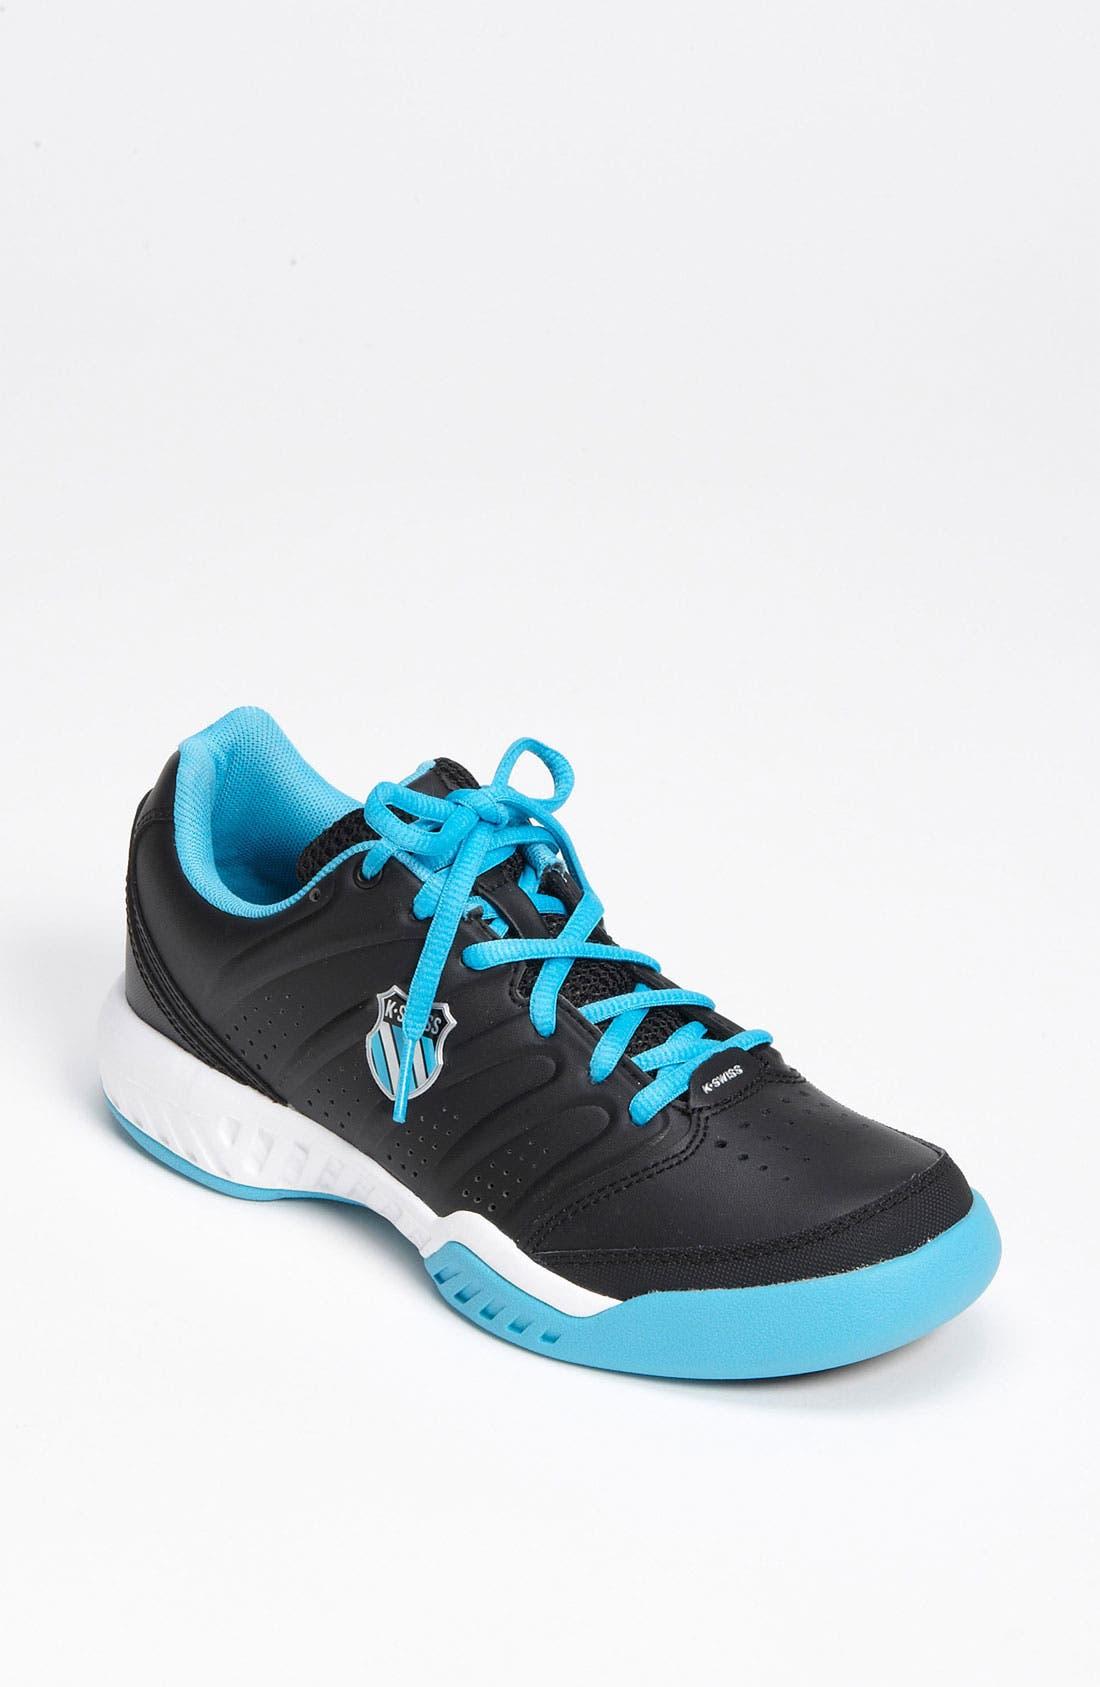 Alternate Image 1 Selected - K-Swiss 'Ultrascendor 11' Tennis Shoe (Women)